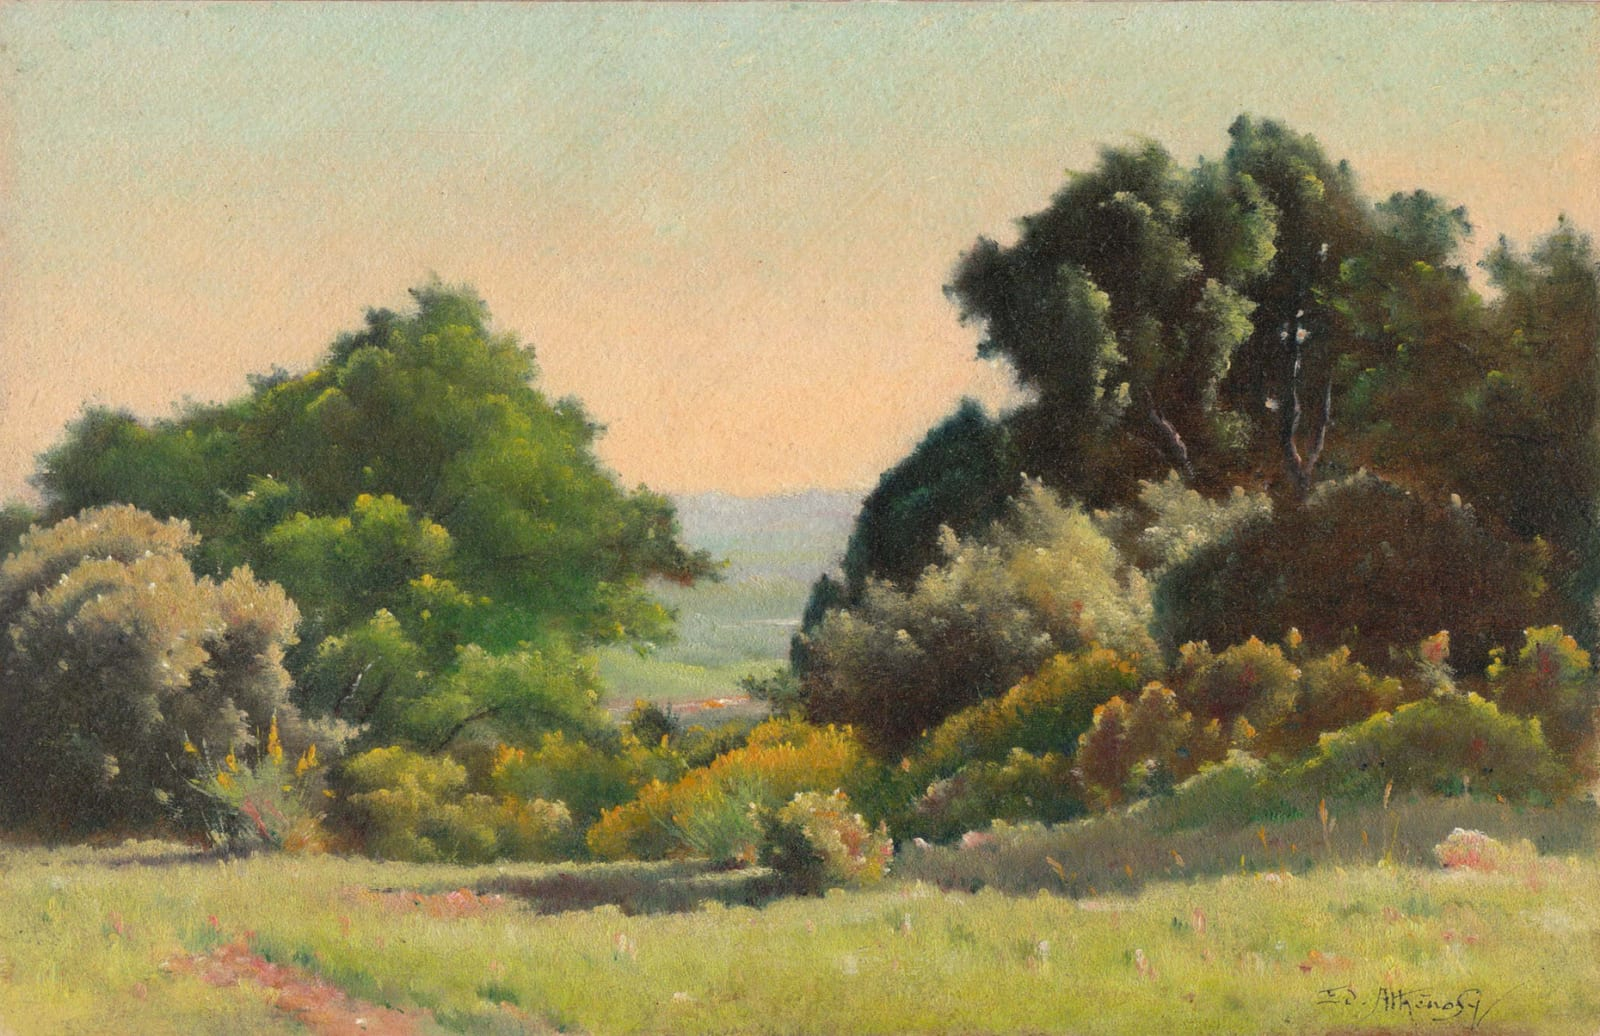 EDOUARD ATHÉNOSY, View to the plain, 1921